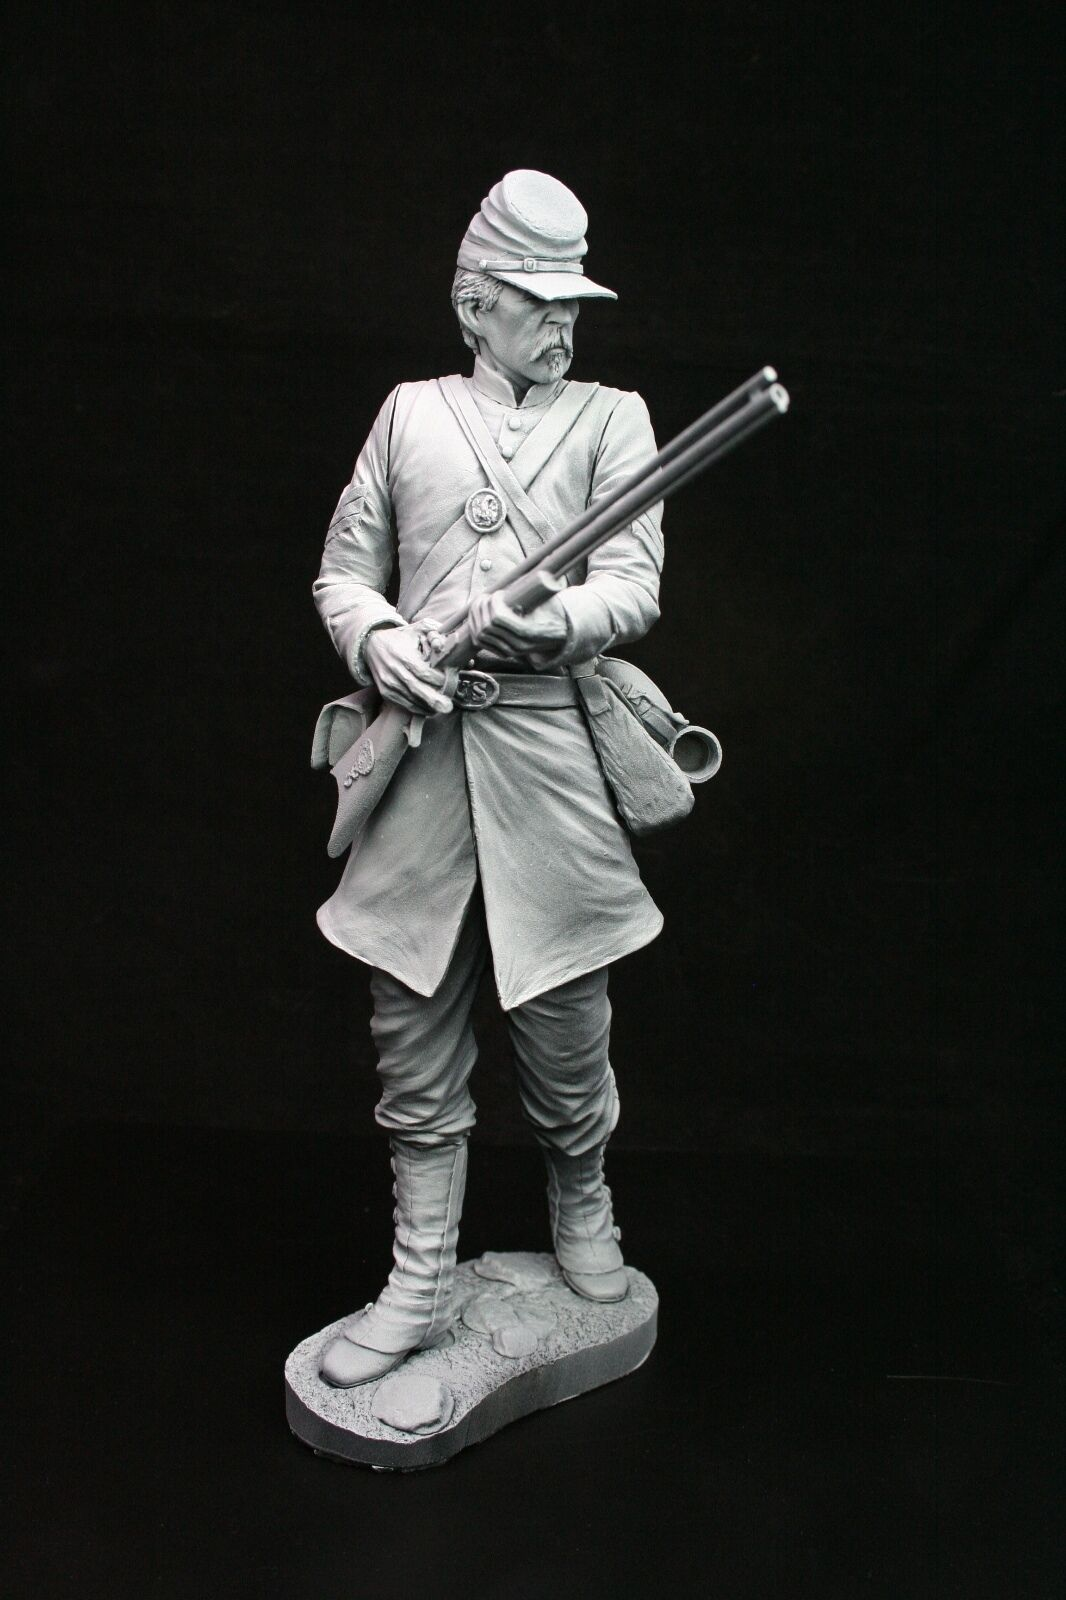 200mm 1 9 Berdan Sharpshooter, American Civil War, sculpted by Carl Reid